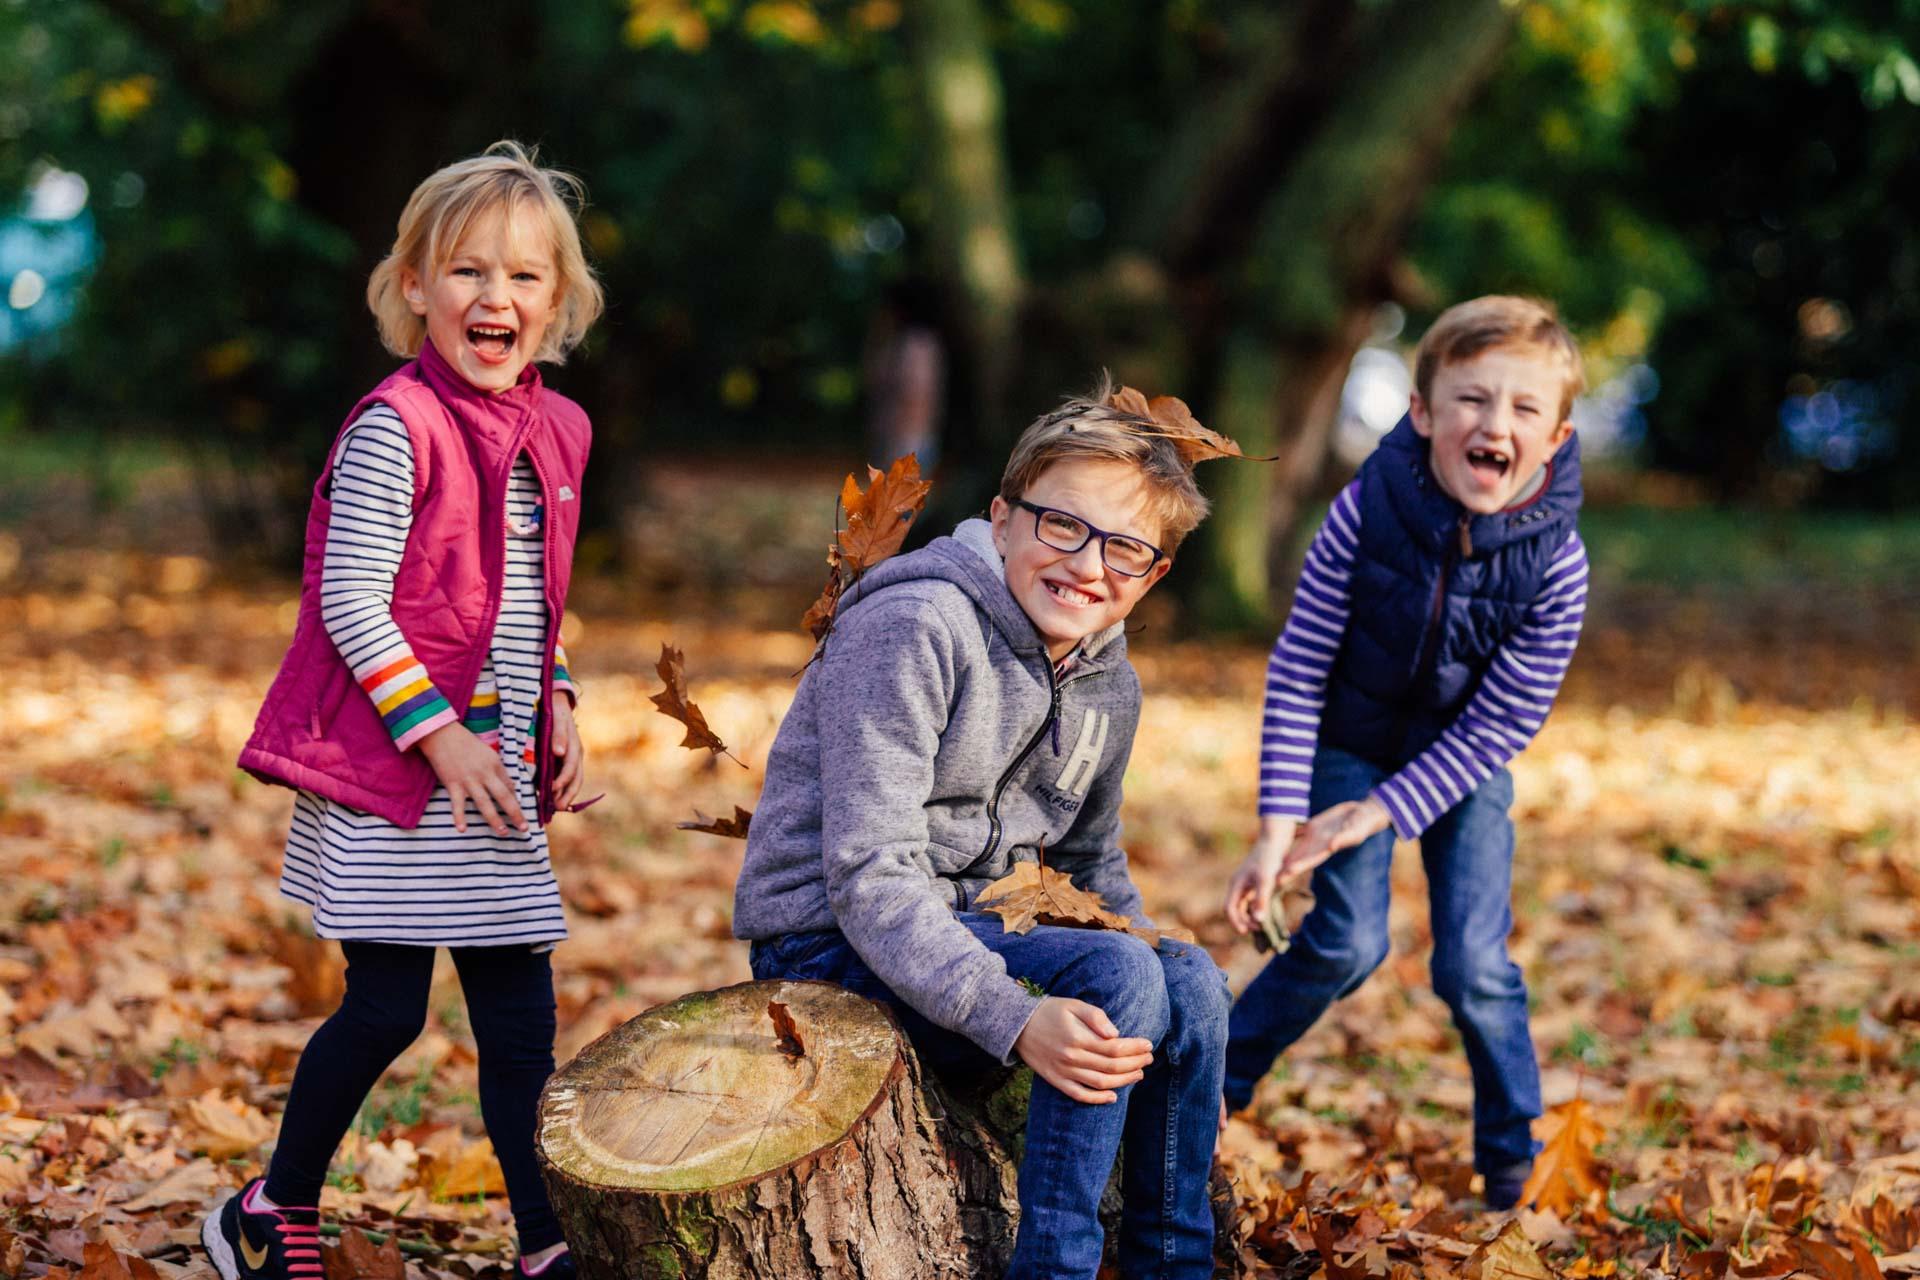 Children Family Photography by Ricky Parker Photography 26